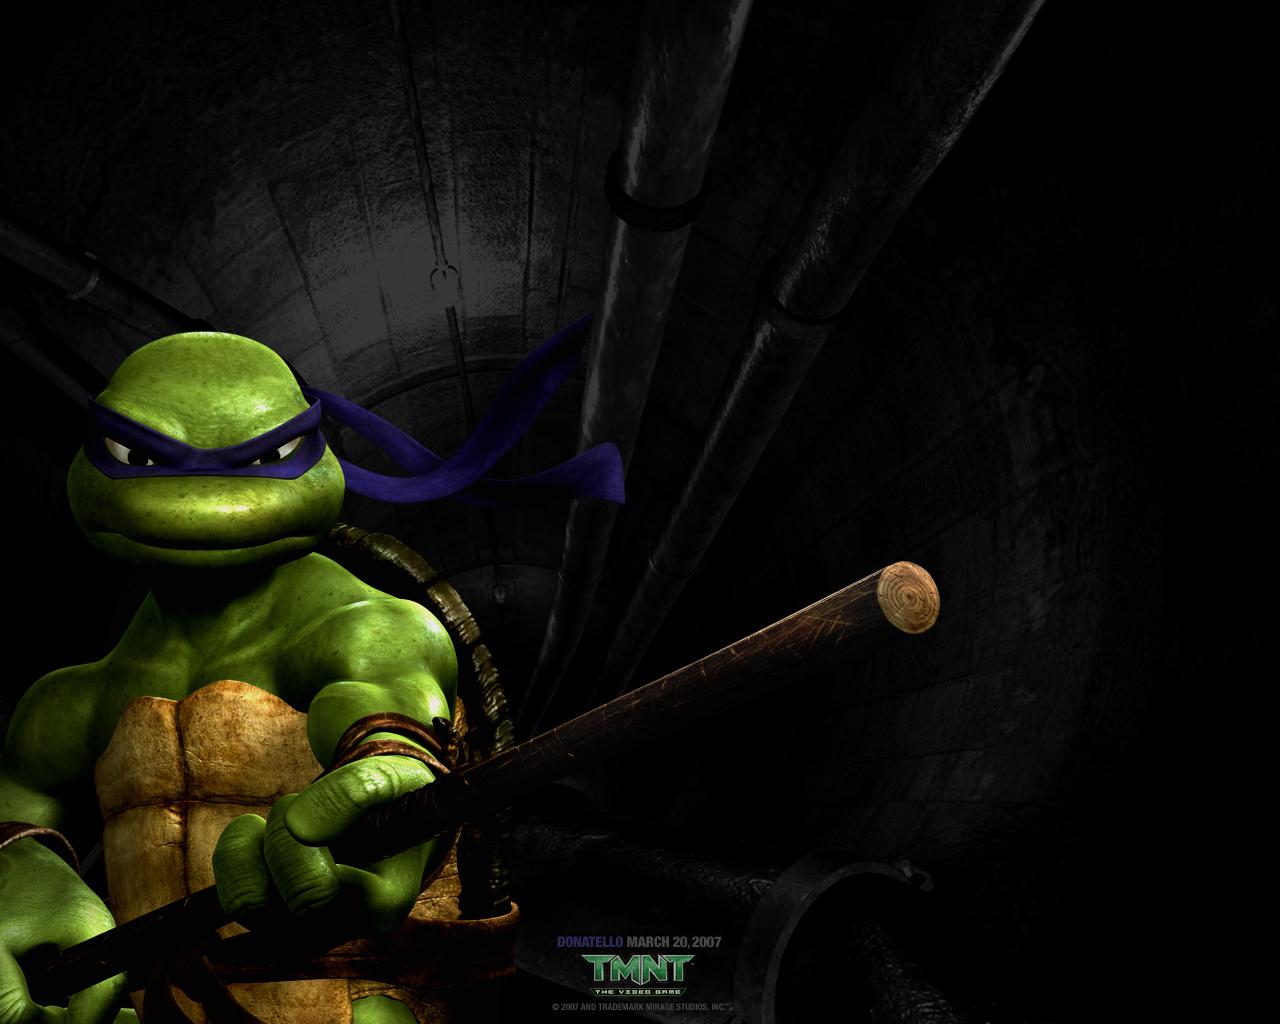 Desktop Wallpapers Teenage Mutant Ninja Turtles Cartoons